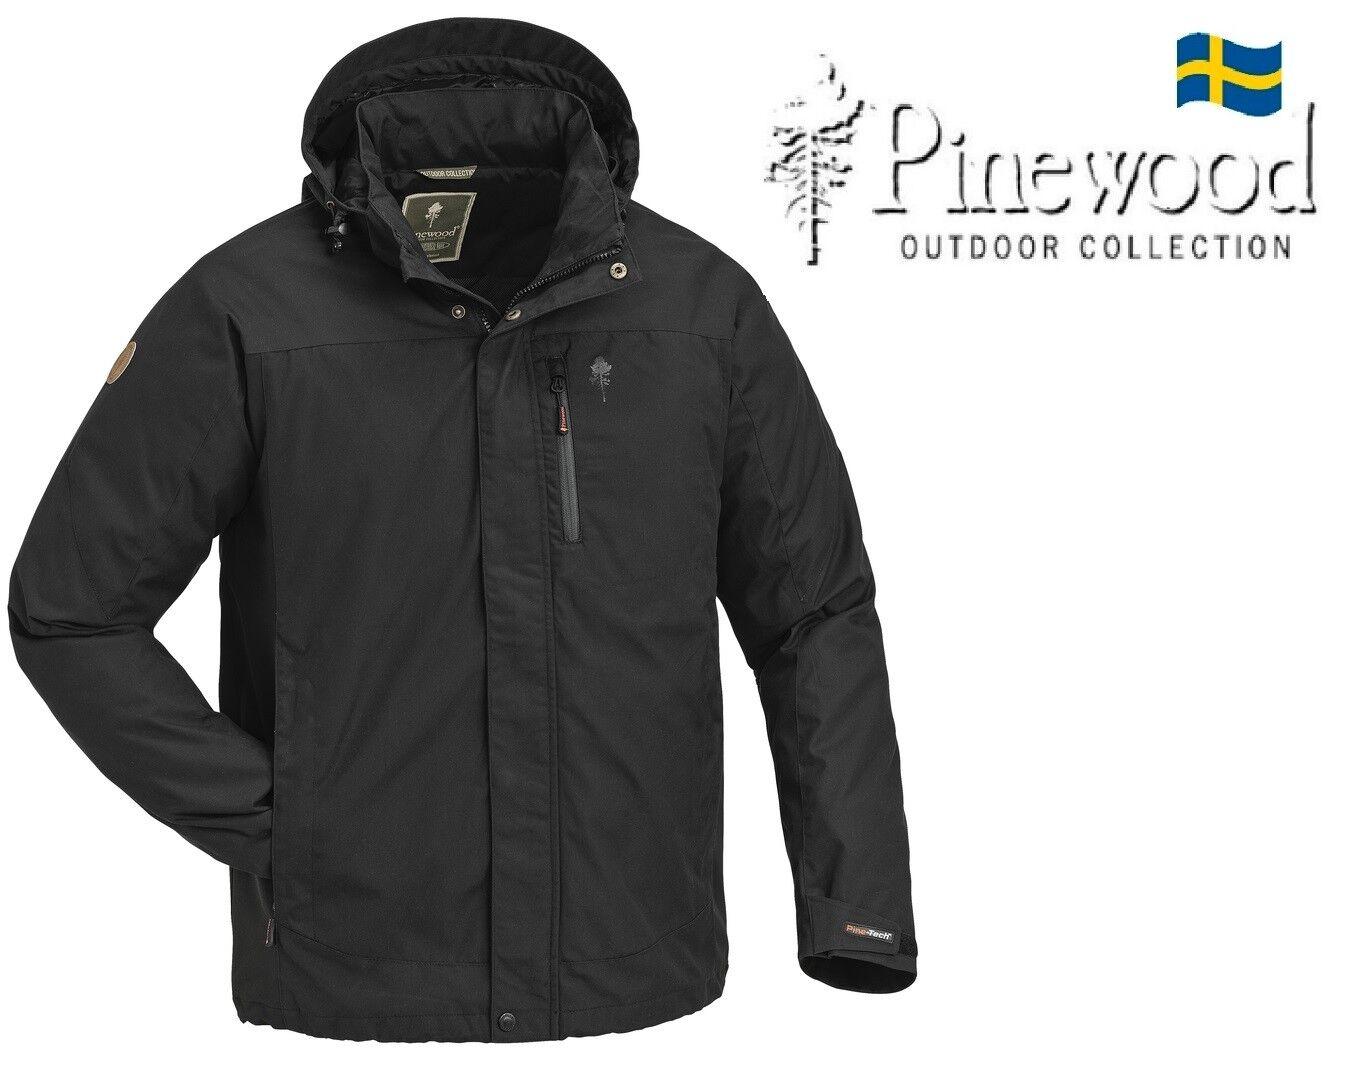 Pinewood Caribou TC Extreme -Absolut Wind- und wasserdicht